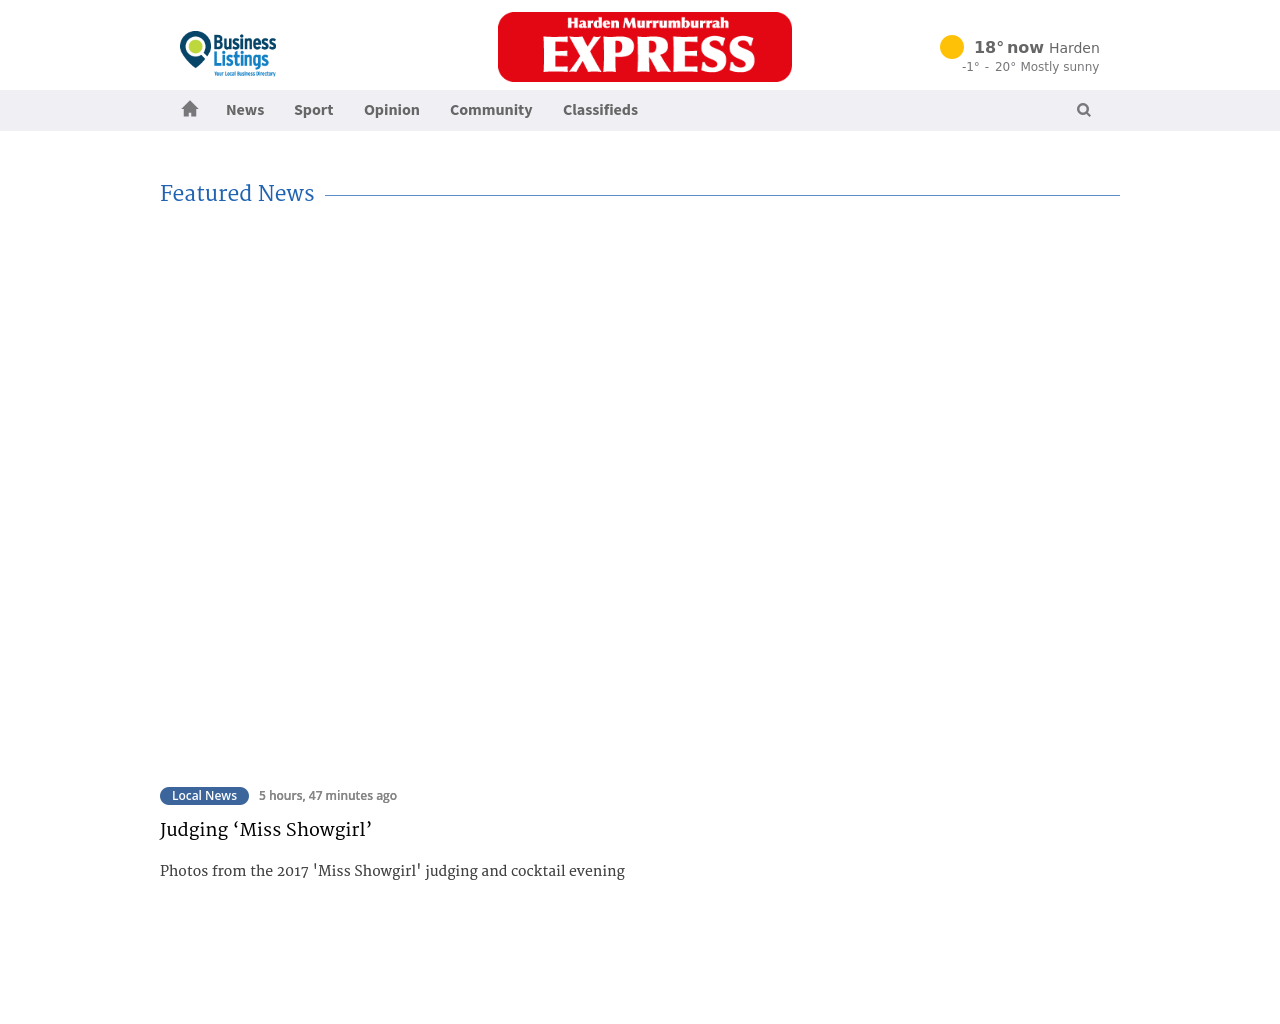 Harden-Murrumburrah-Express-Advertising-Reviews-Pricing